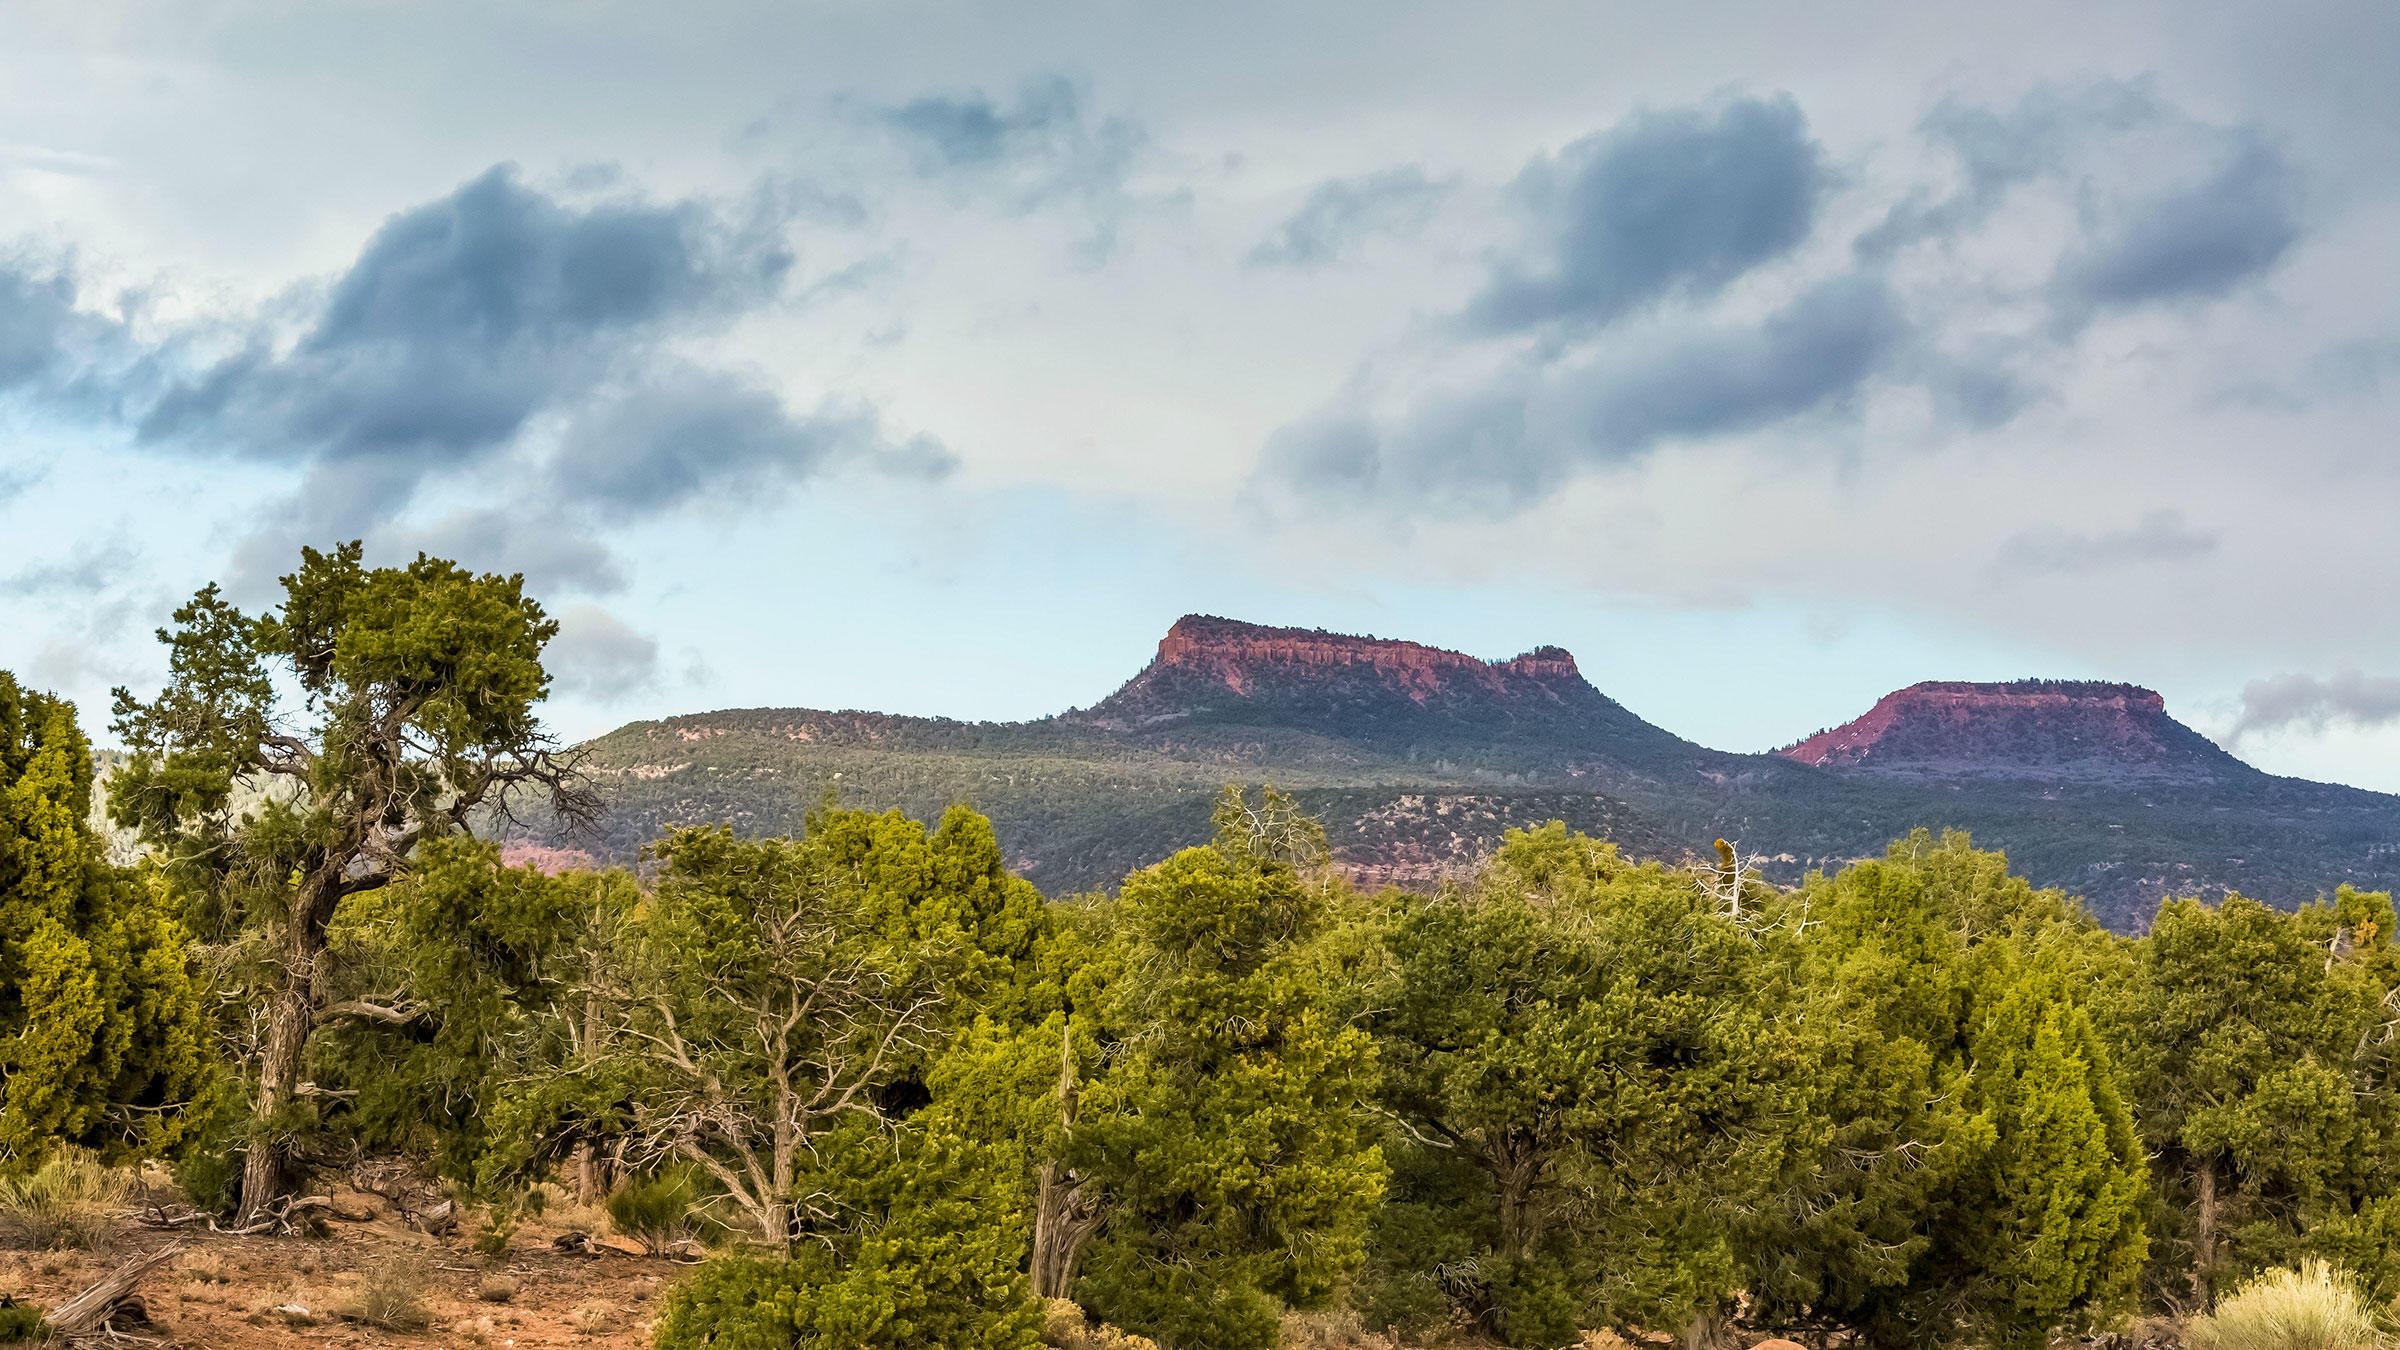 Piñon-juniper forest surrounding Bears Ears National Monument. Lee Rentz/Alamy